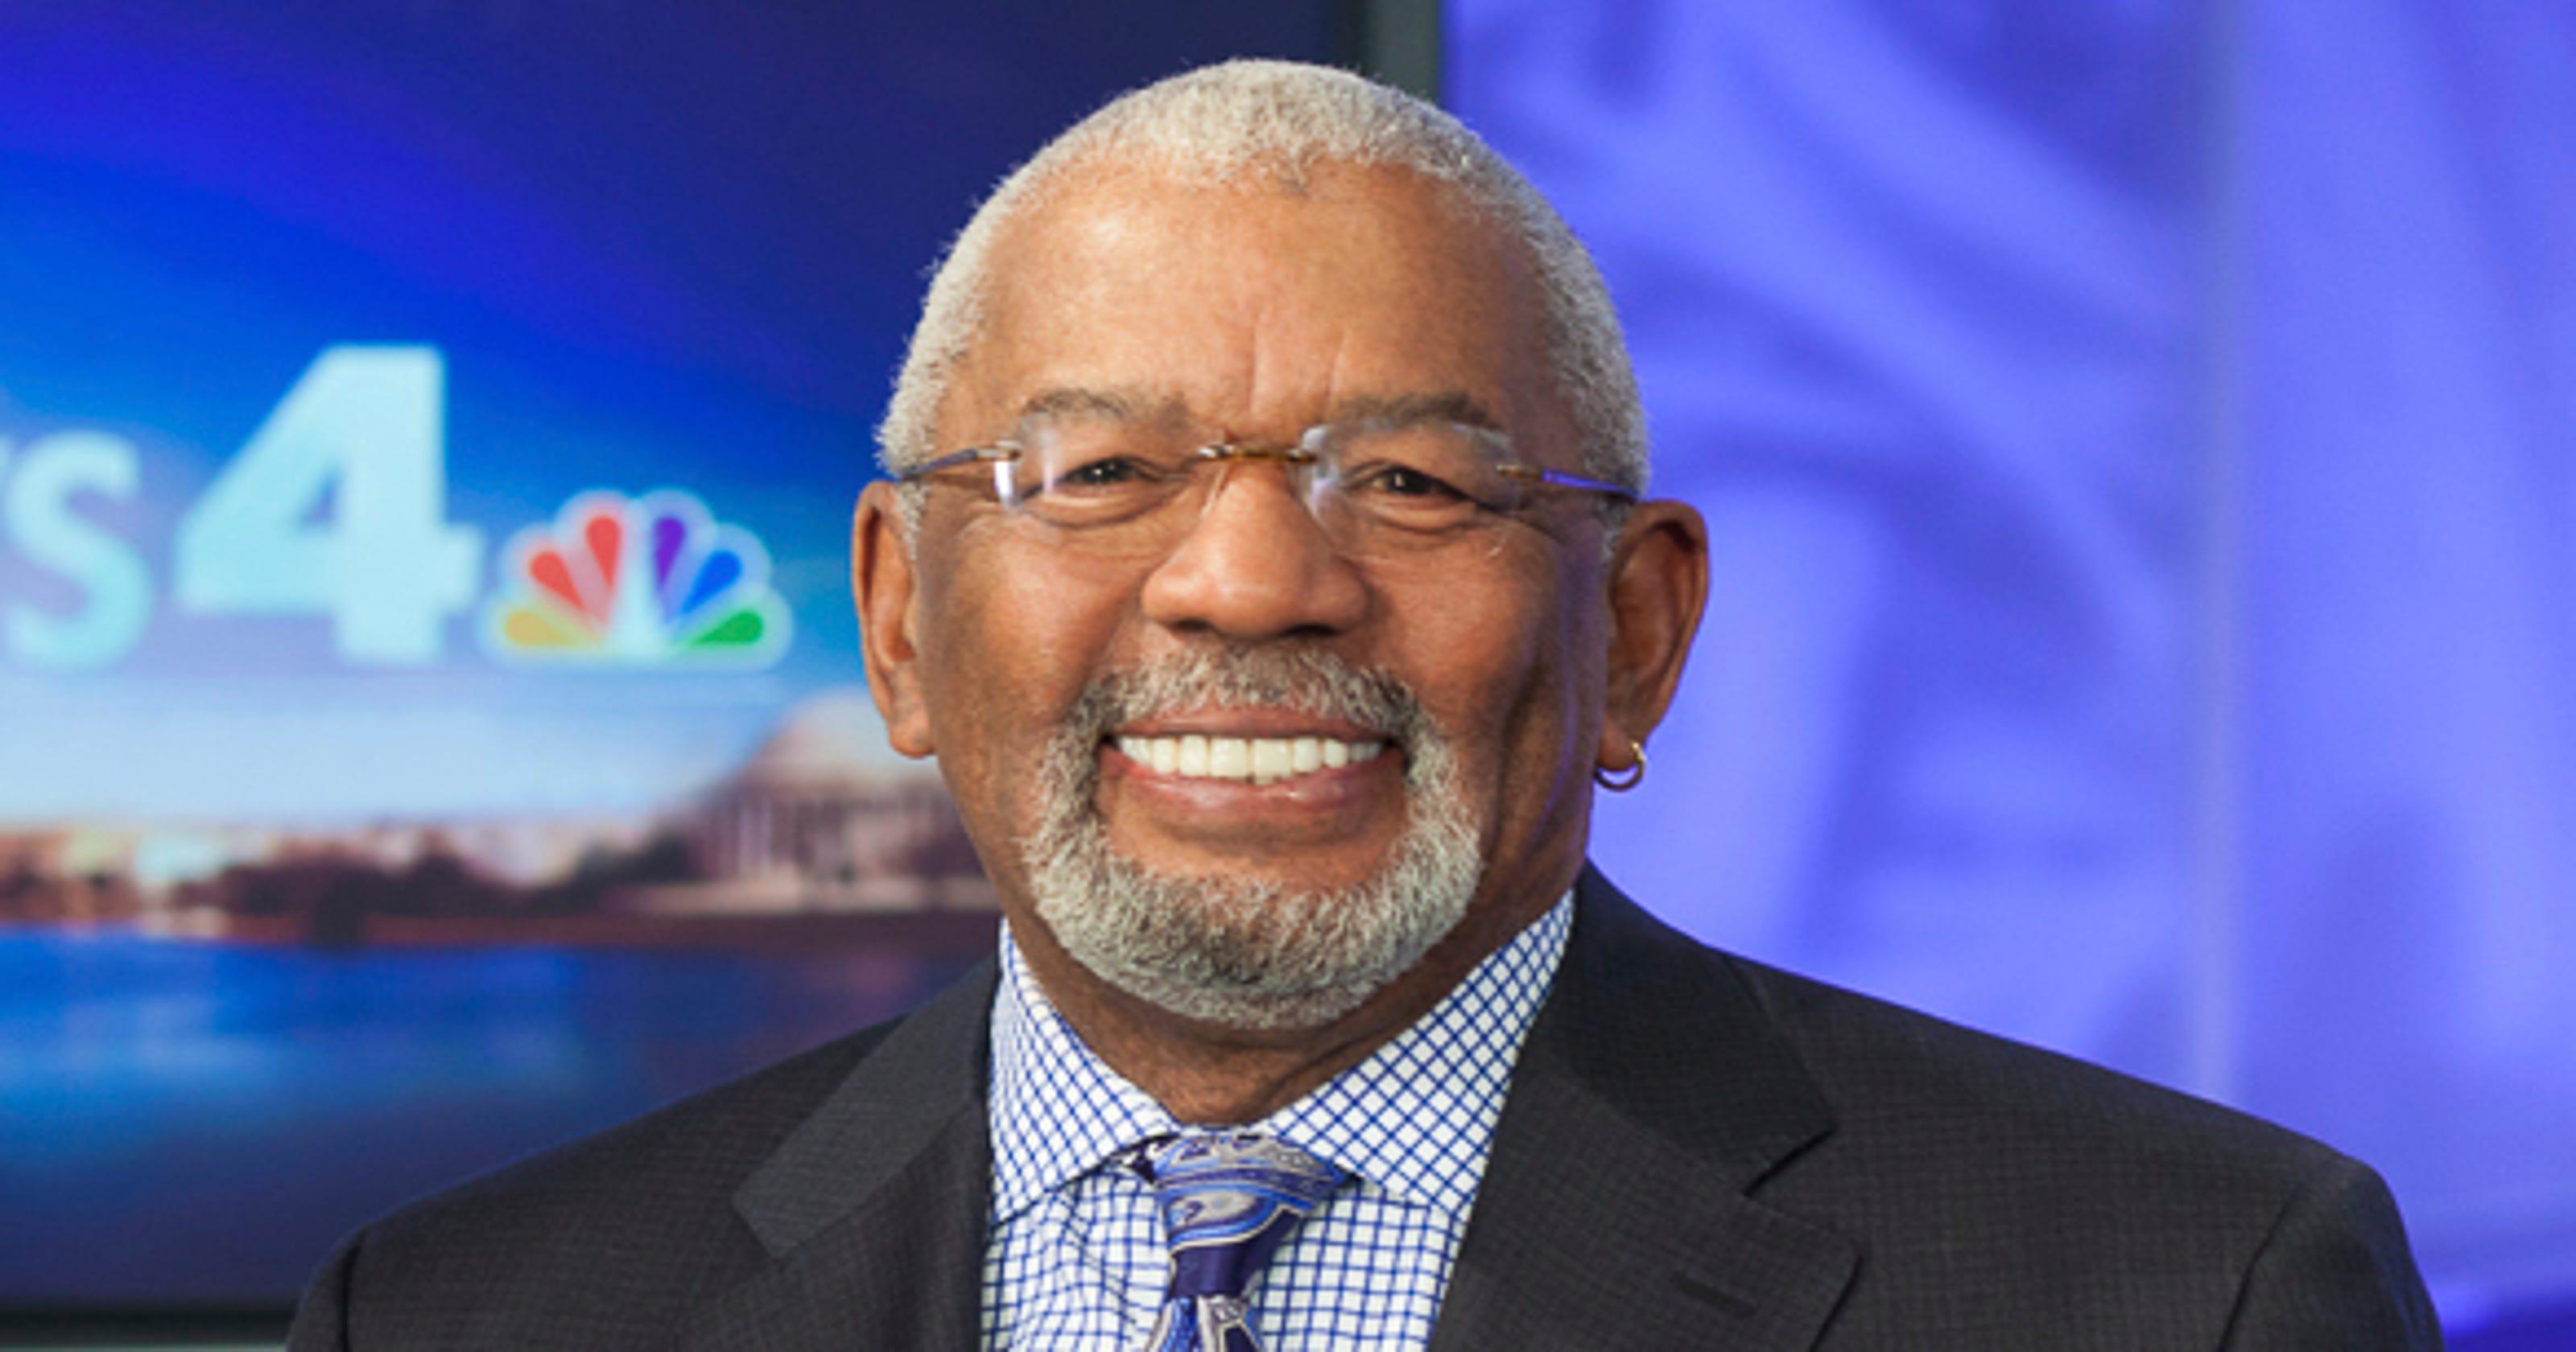 60d0952f70b Longtime TV news anchor Jim Vance dies